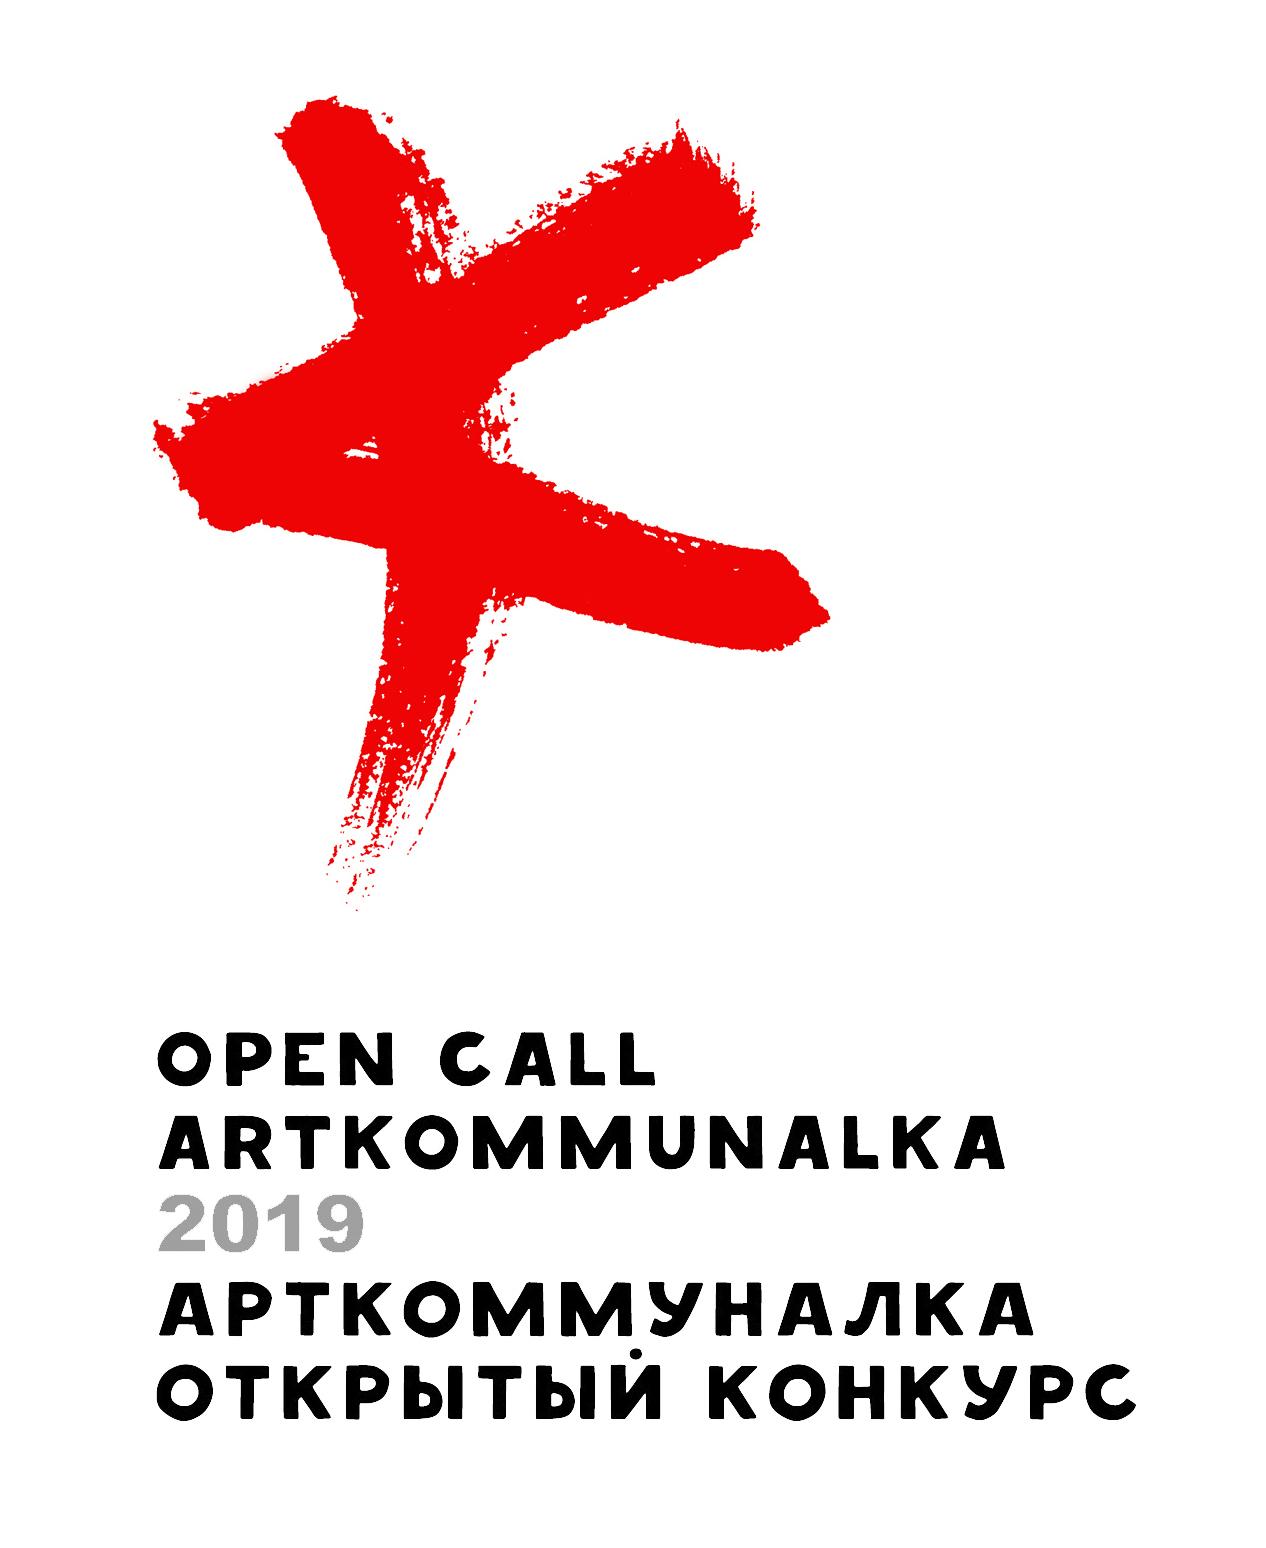 Условия конкурса | artkommunalka com